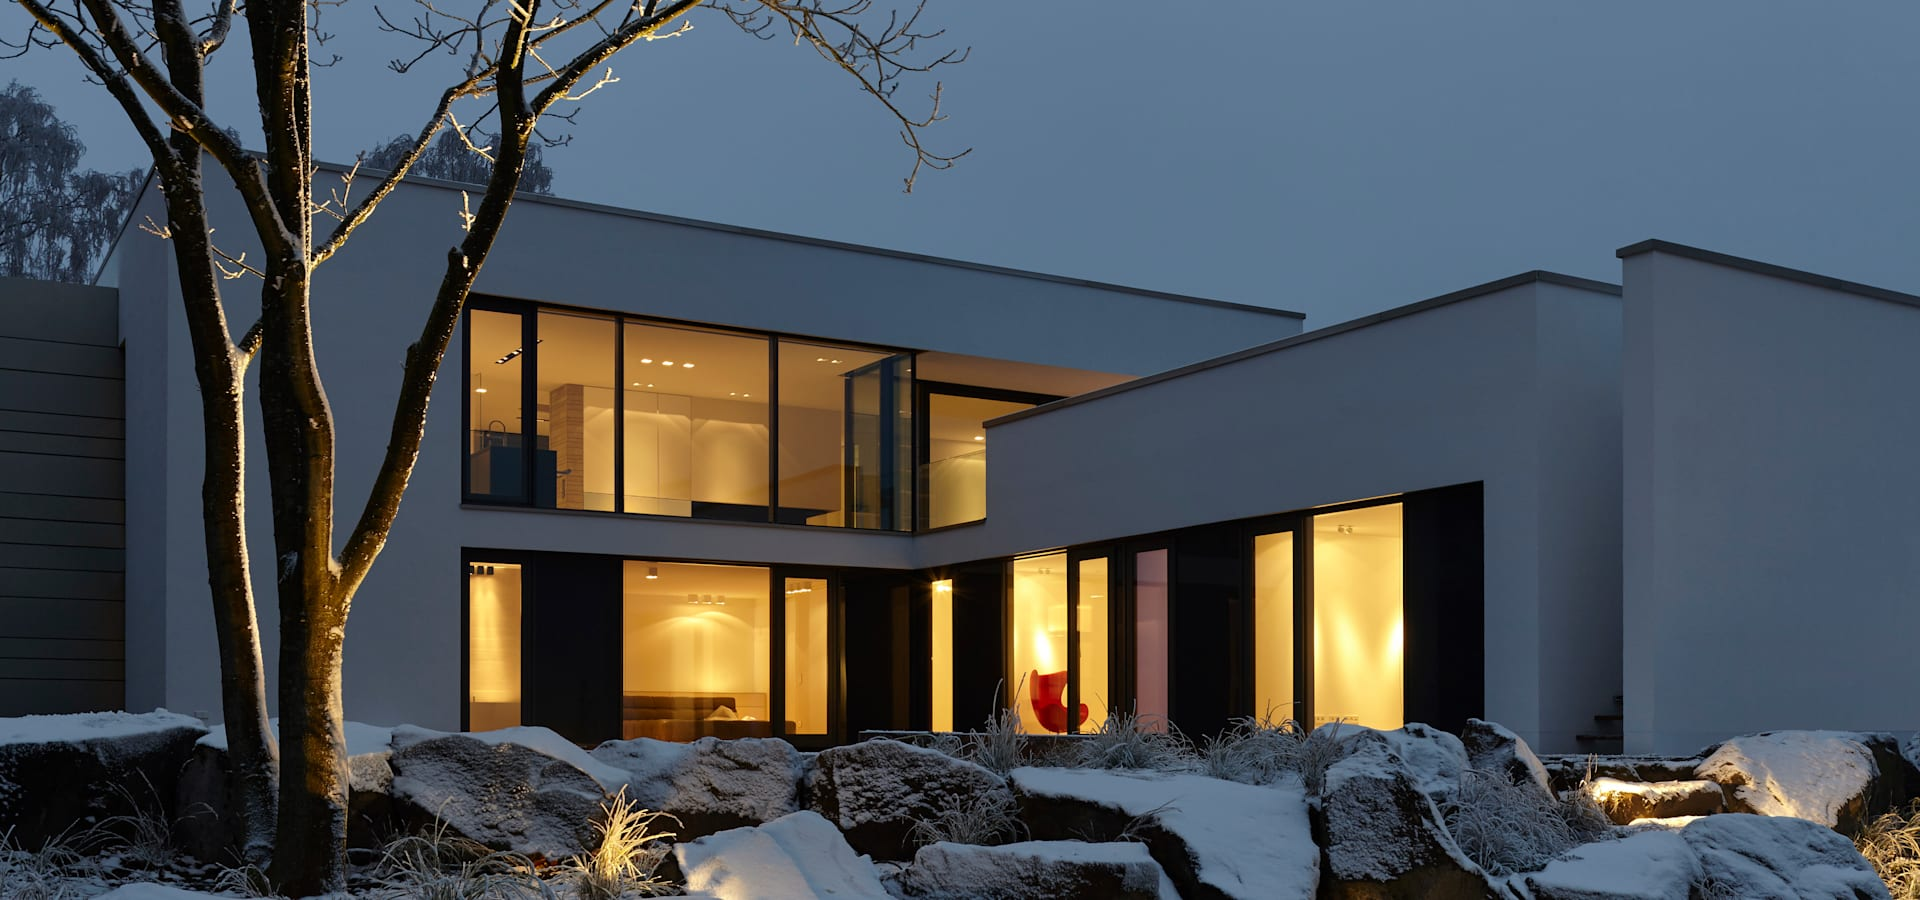 fachwerk modern interesting soleta zeroenergy sustainable. Black Bedroom Furniture Sets. Home Design Ideas